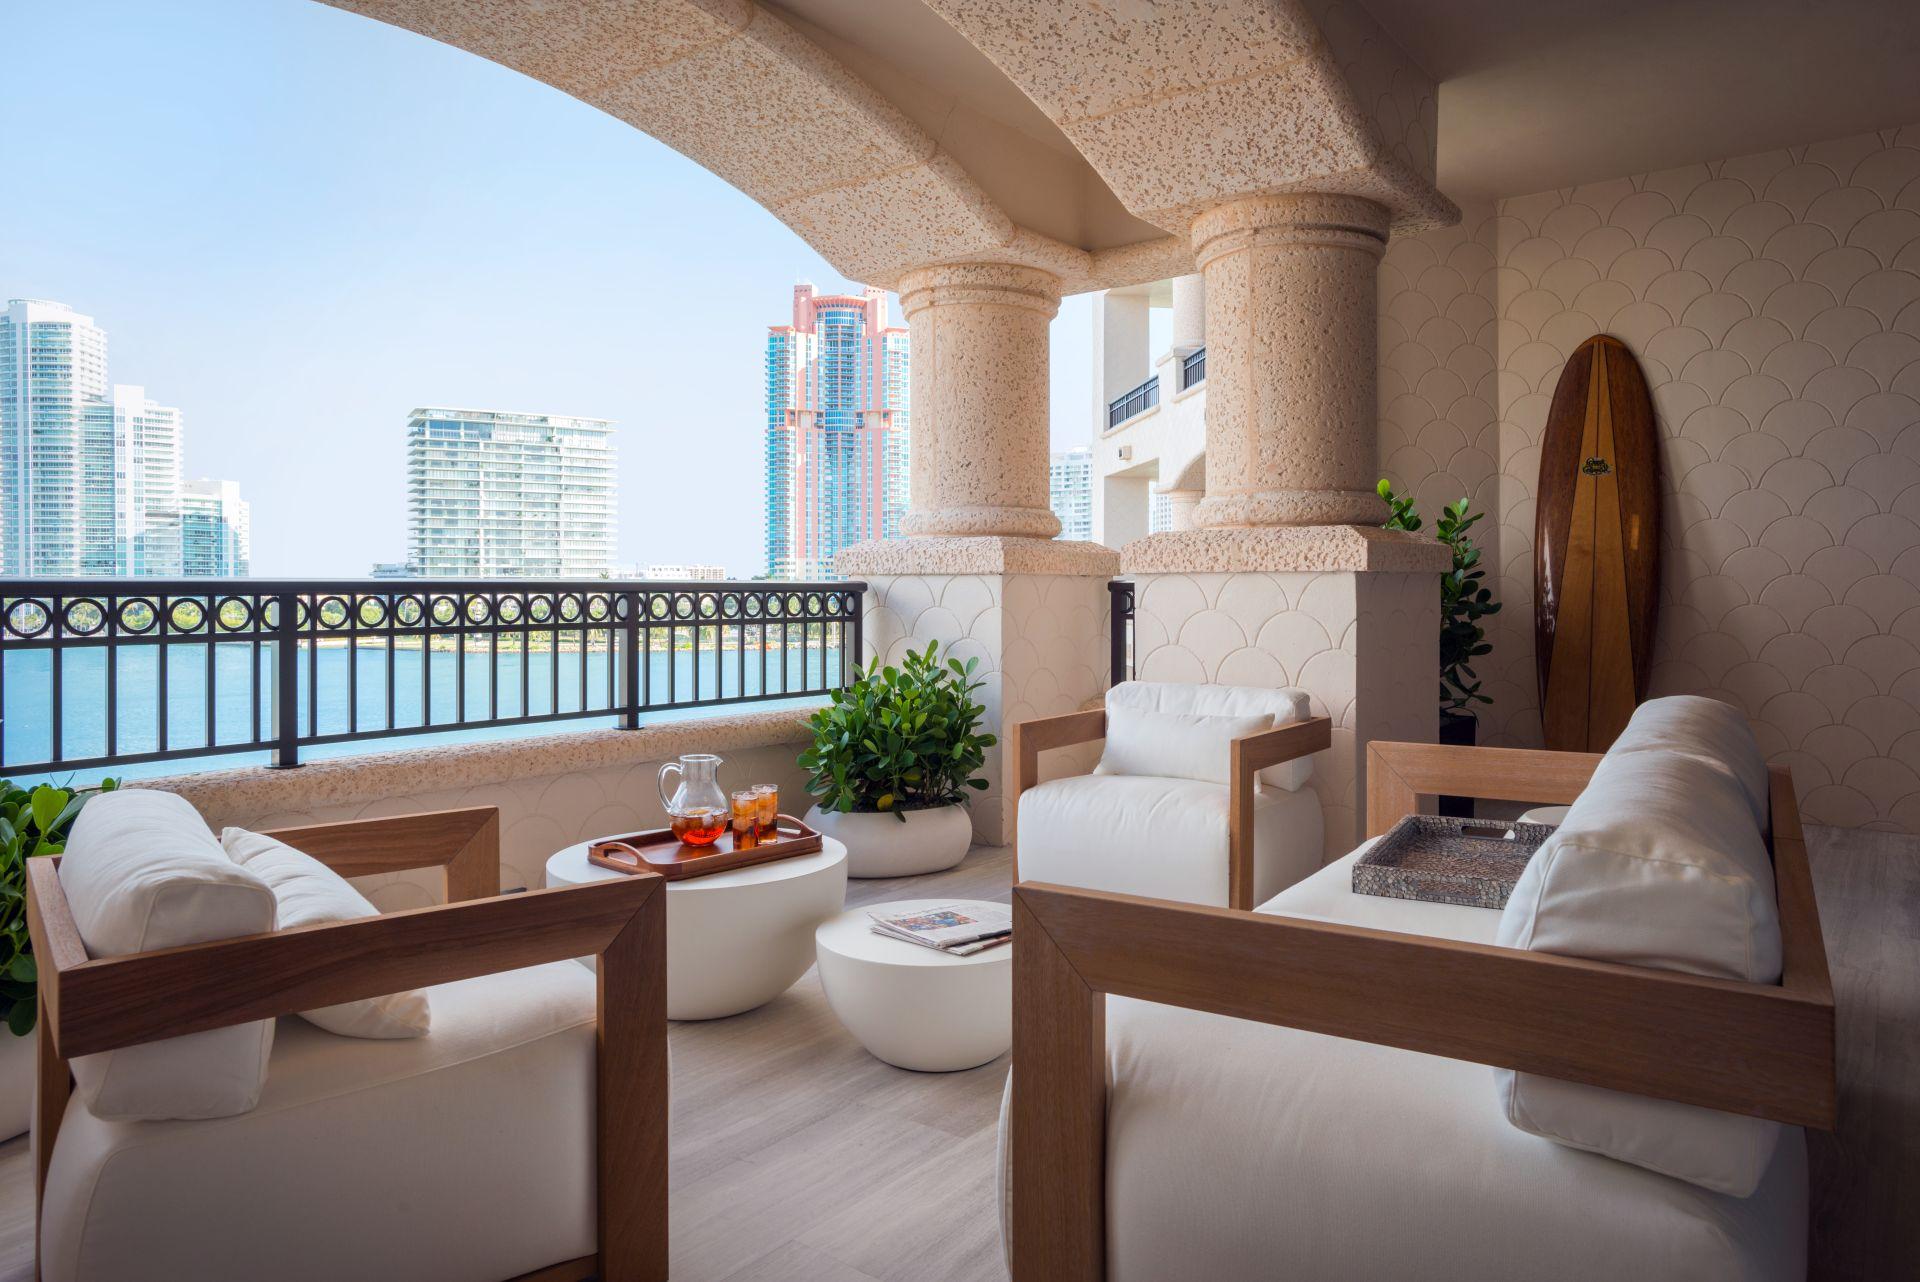 Miami luxury real estate for sale